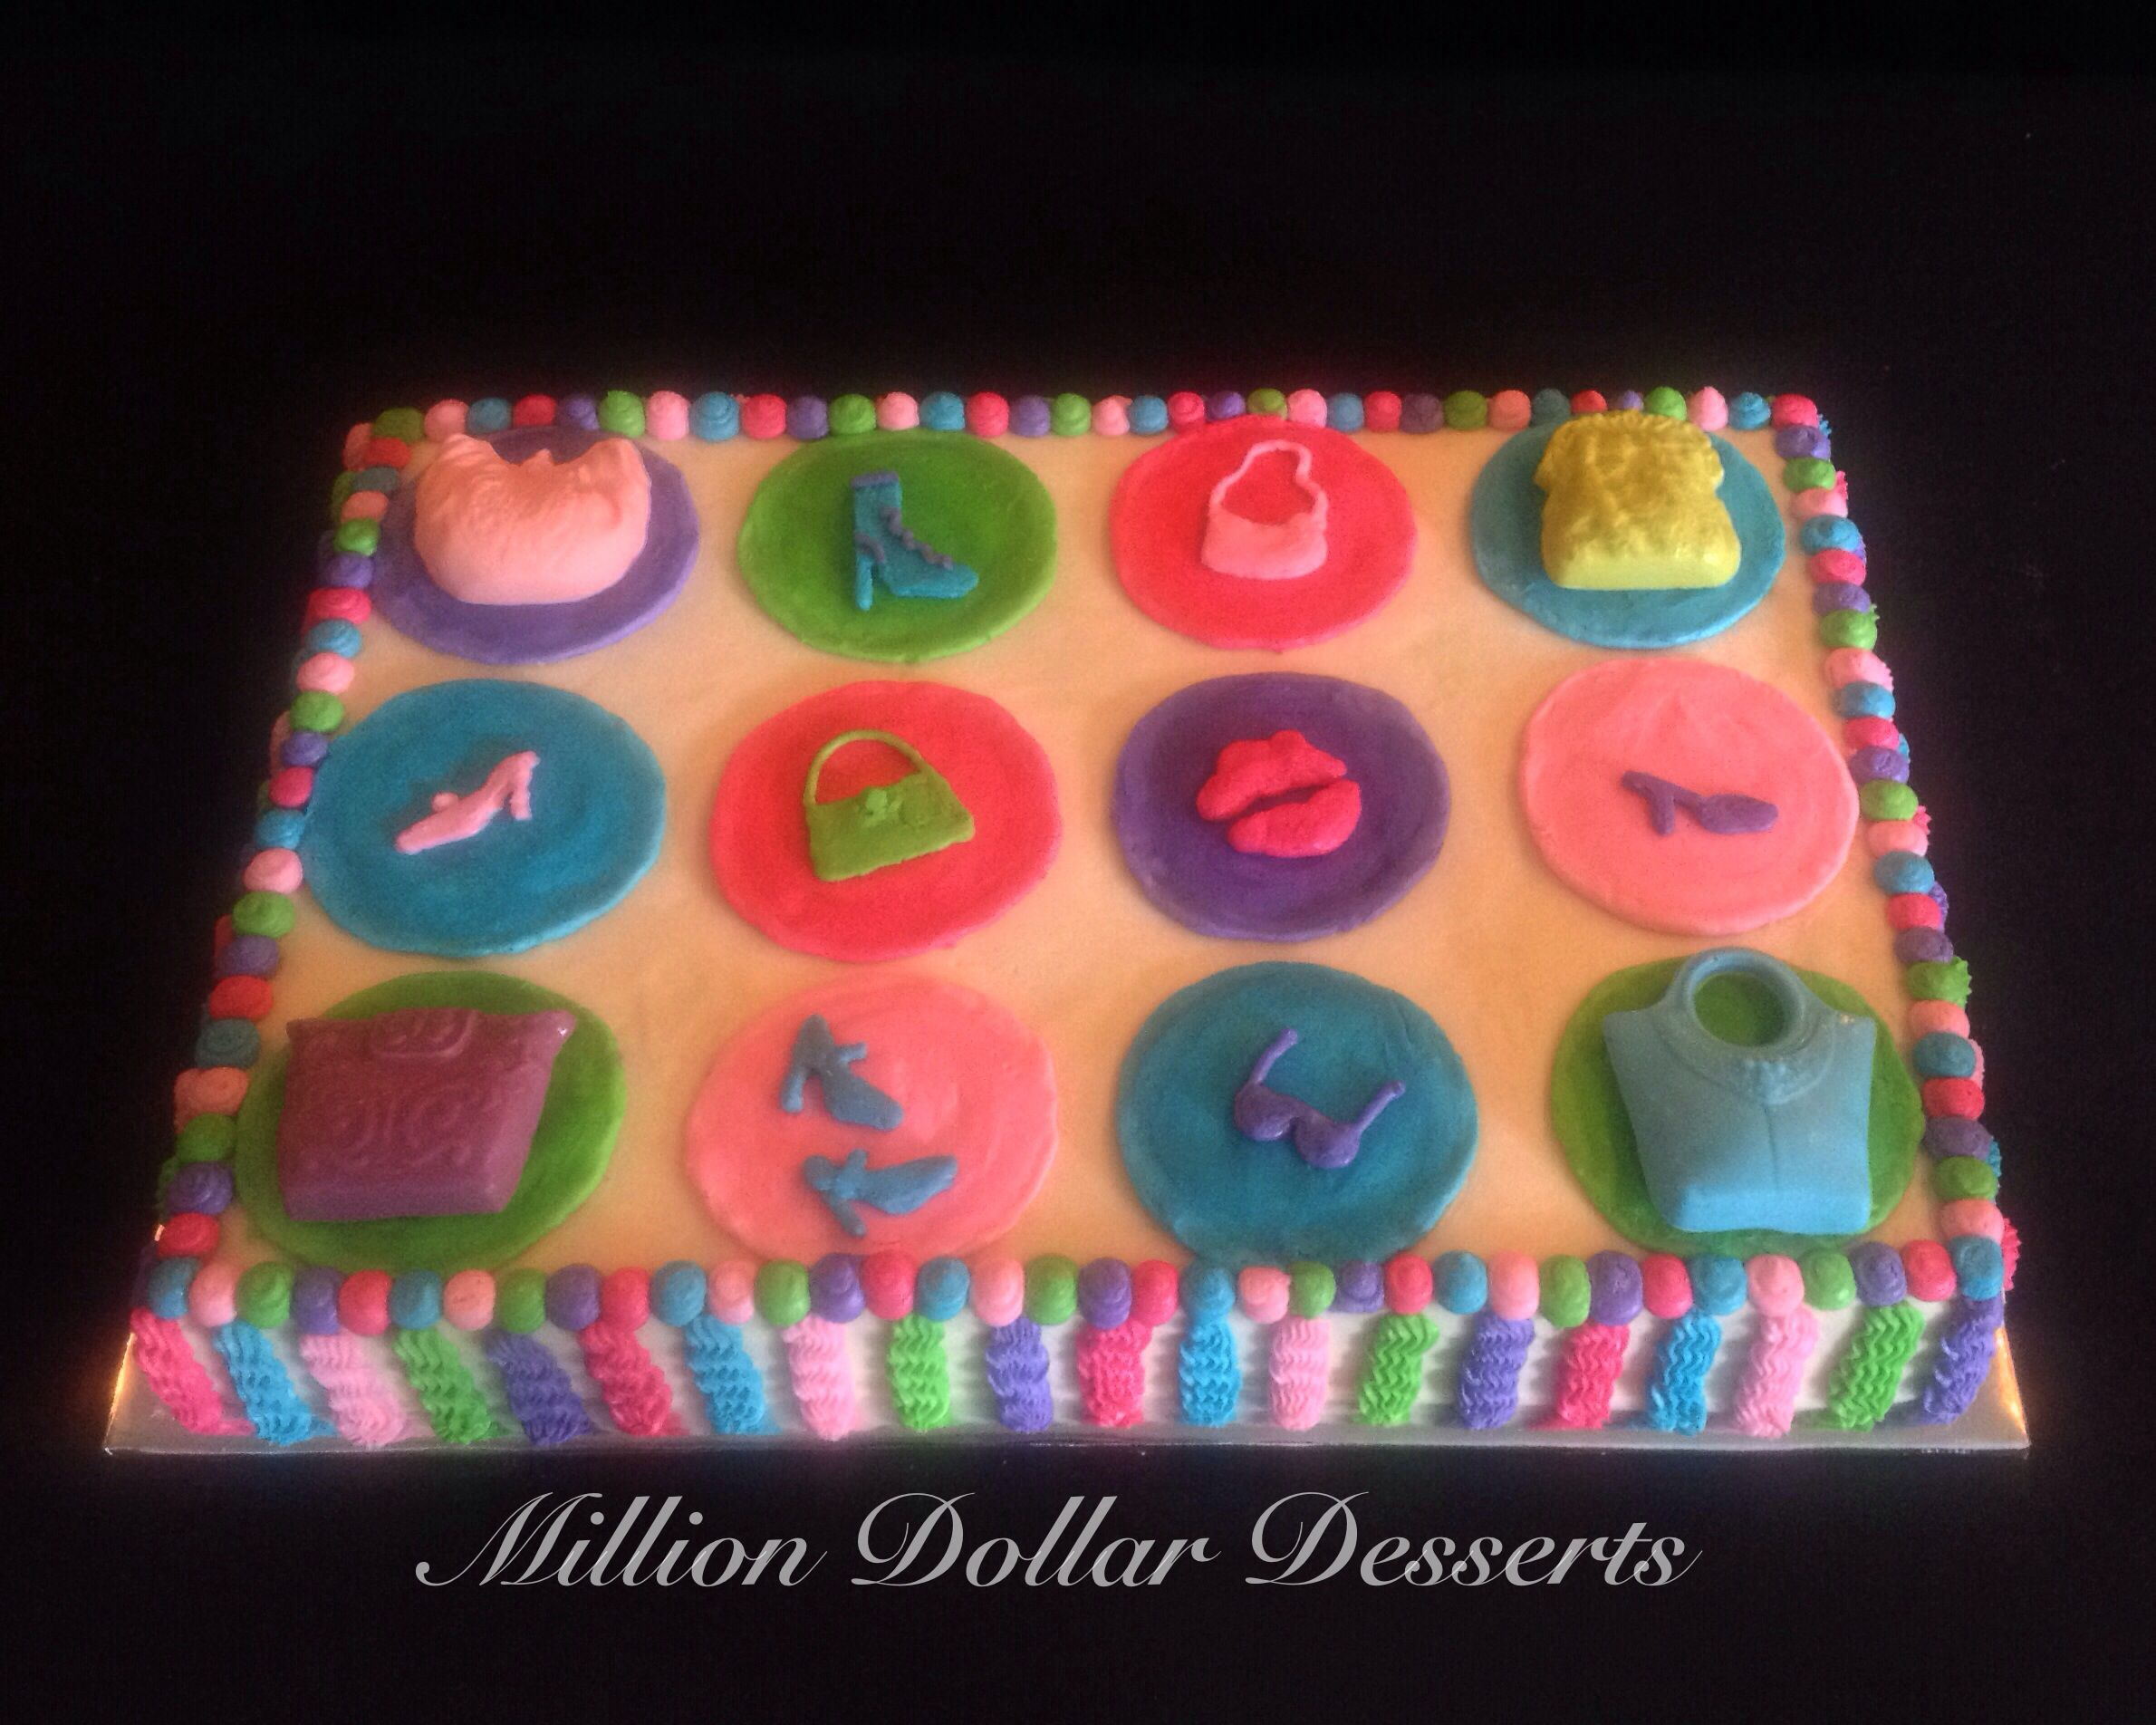 Barbie Sheet Cake Images : Barbie Theme Sheet Cake #MillionDollarDesserts Sheet ...